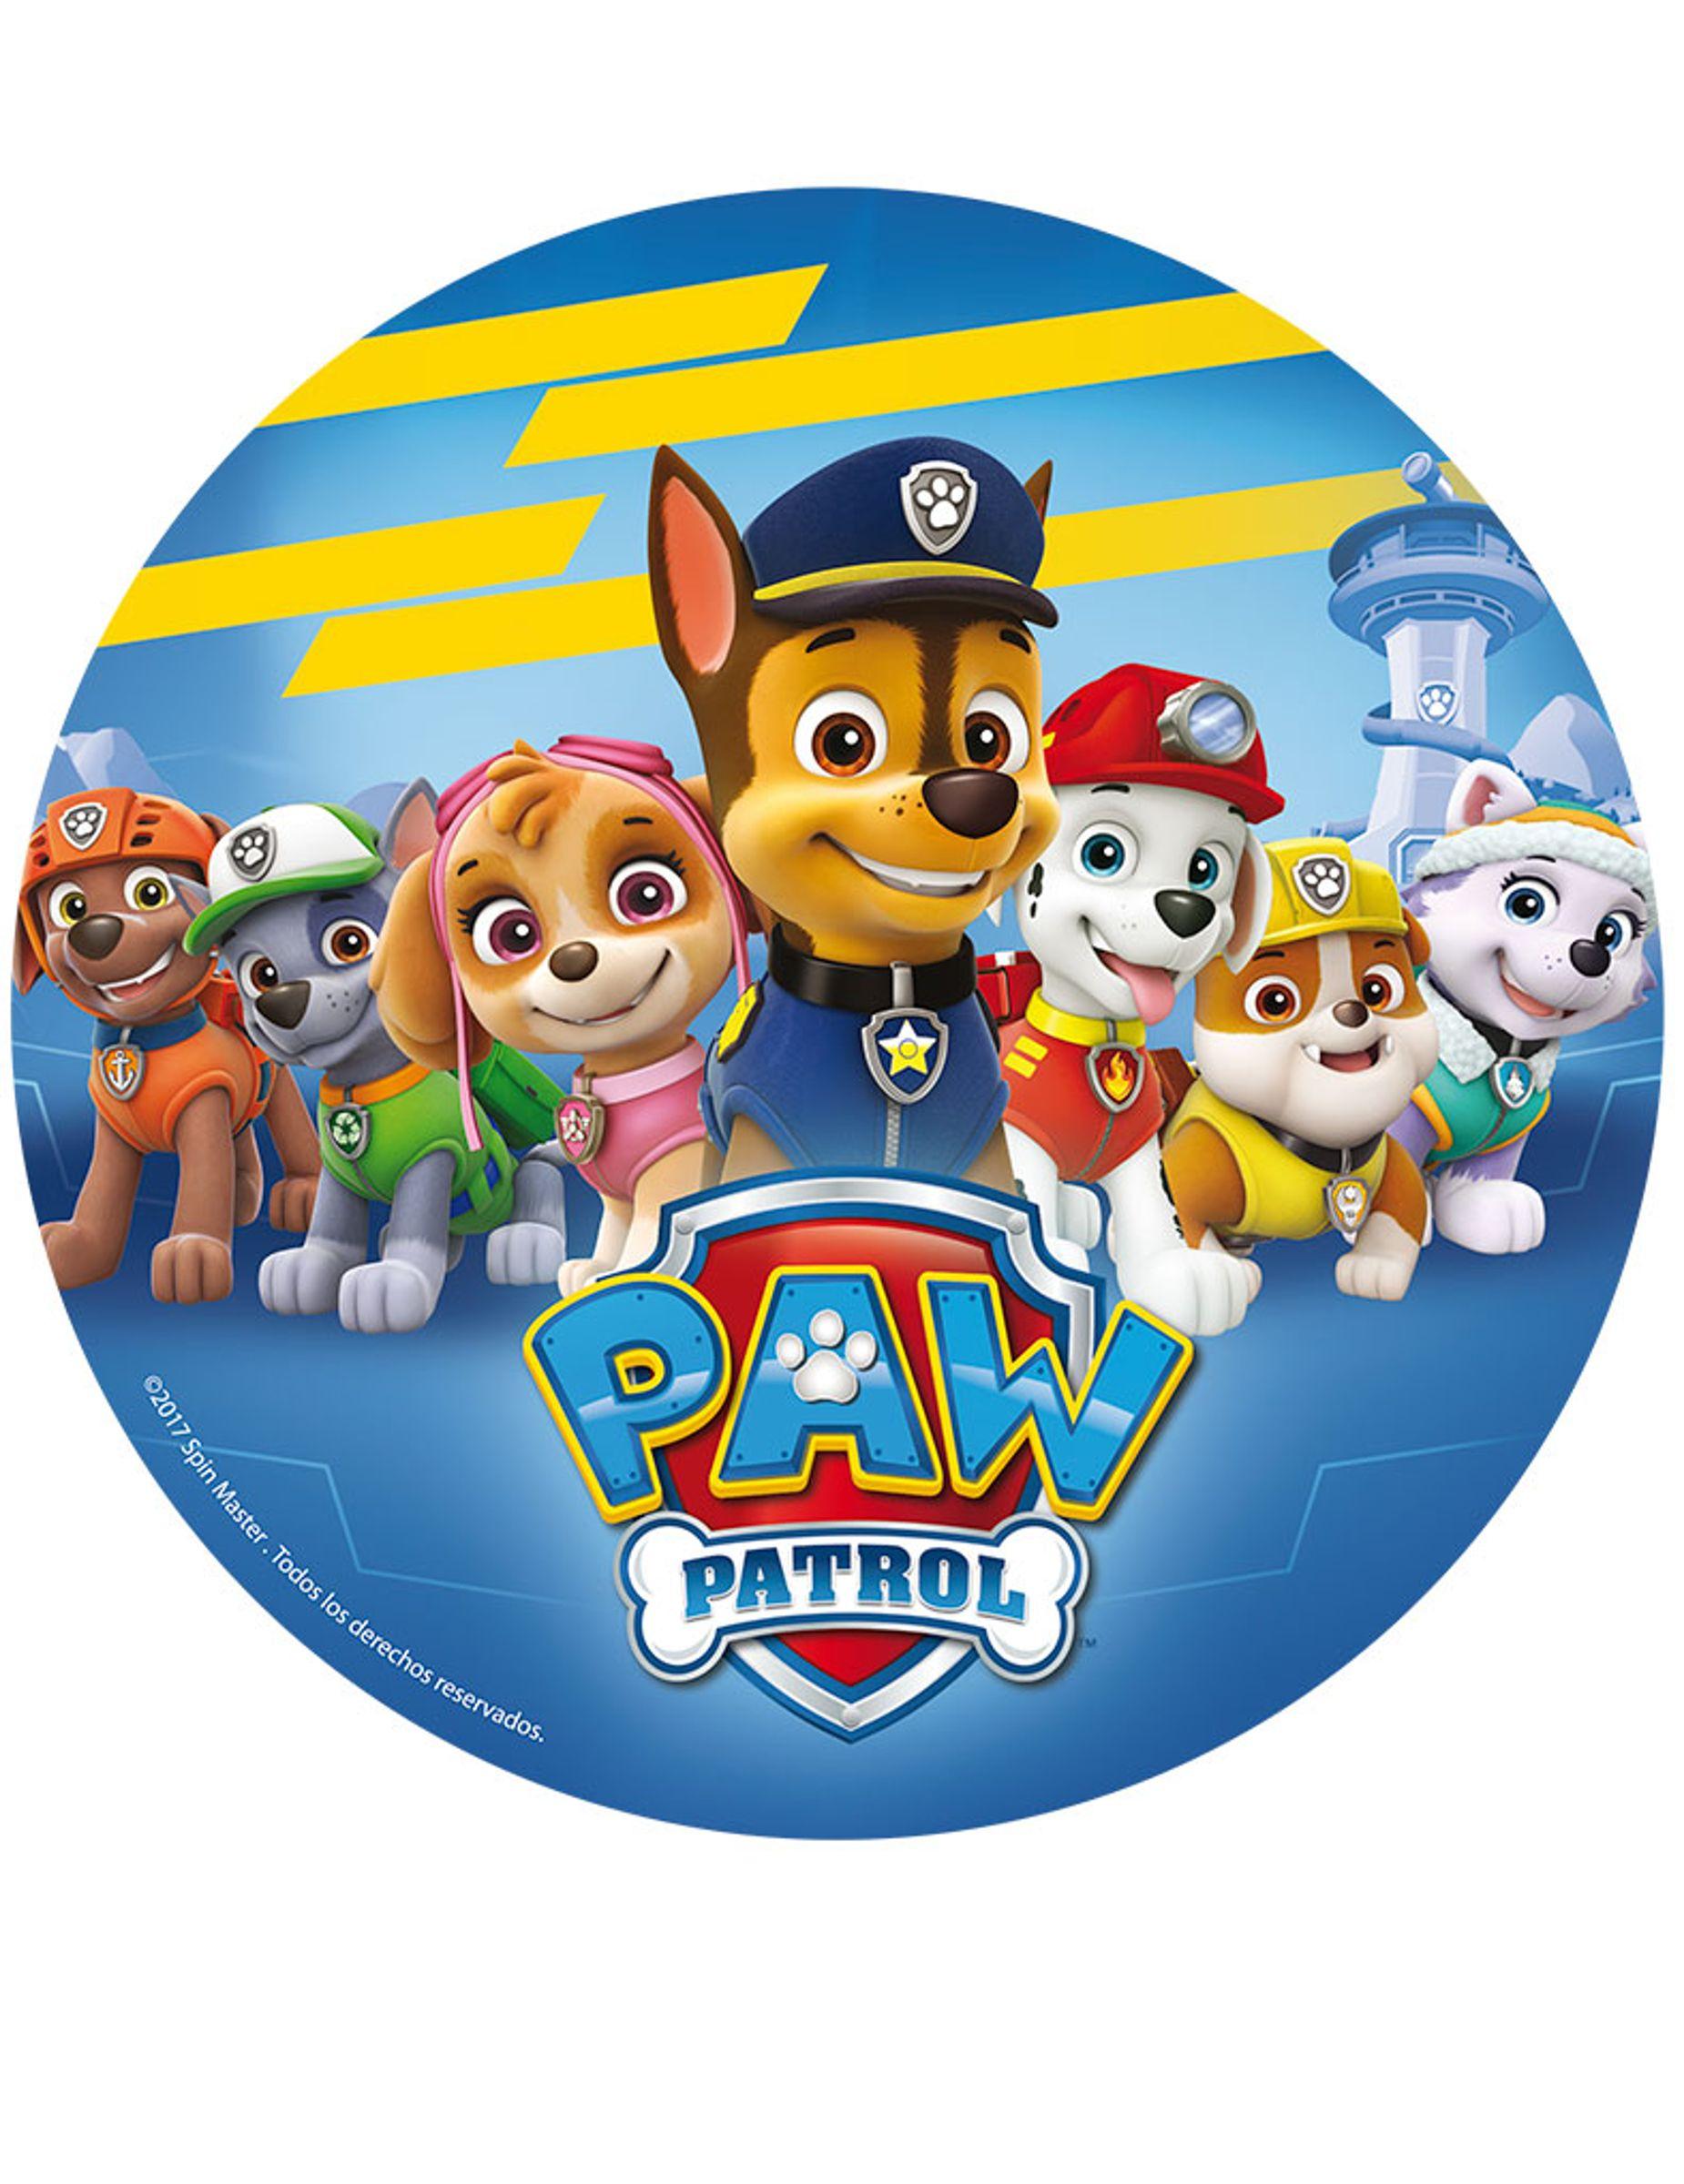 Paw PATROL Compleanno T-shirt con Skye Bambini//Bambino//Bambini//Bambino